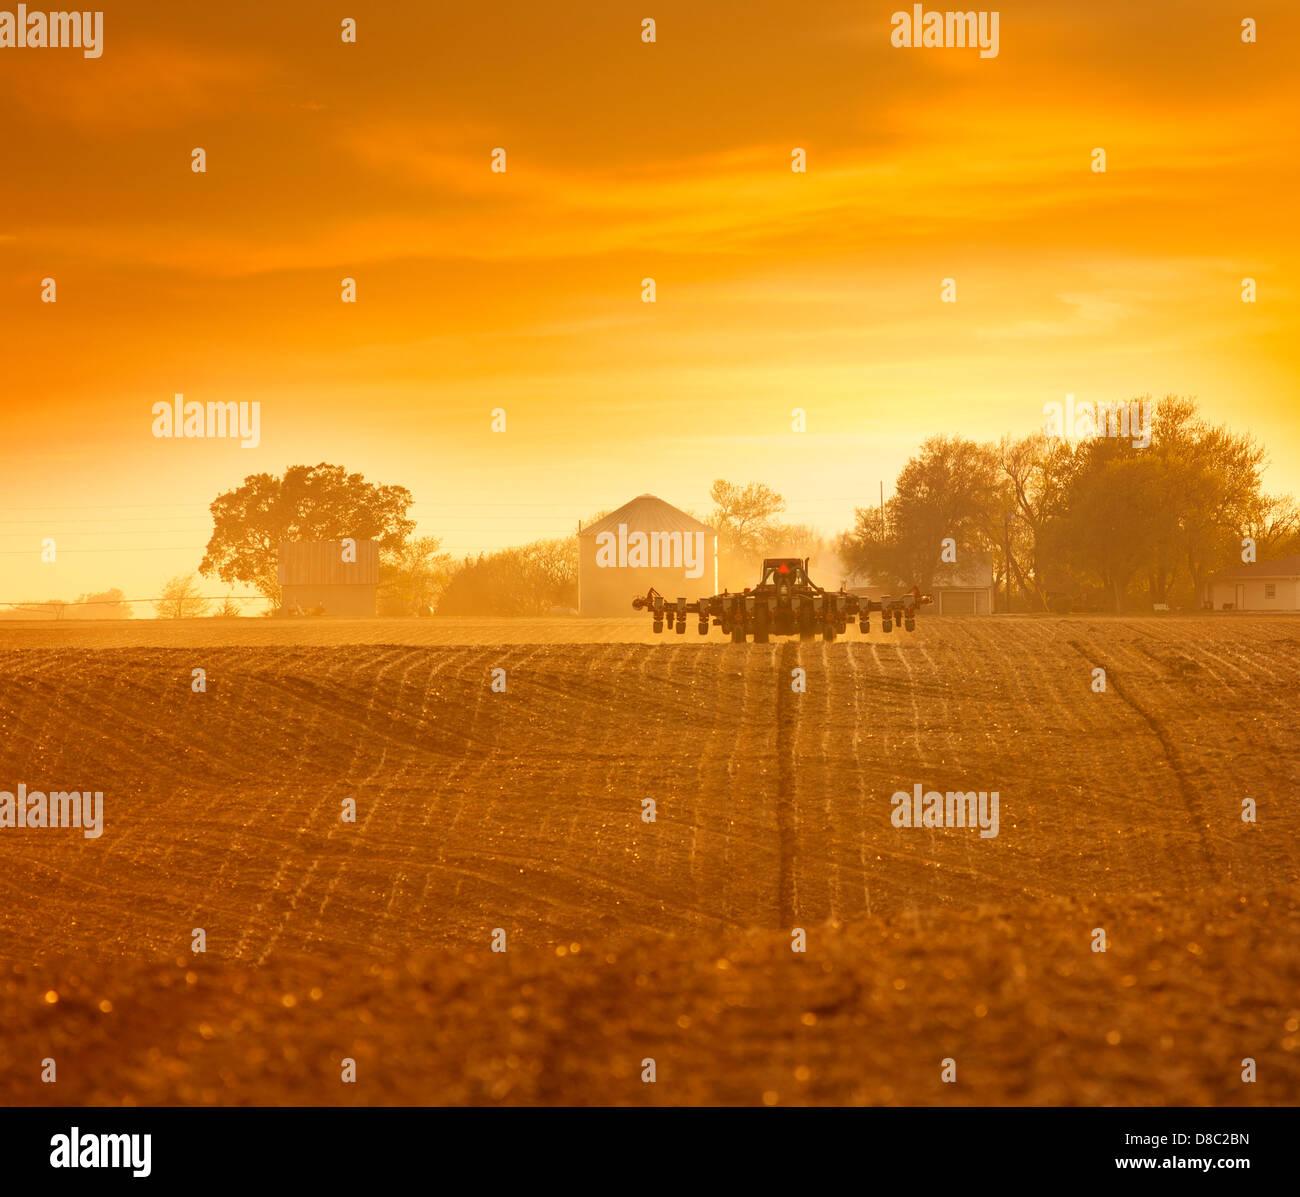 Plantation de maïs Photo Stock